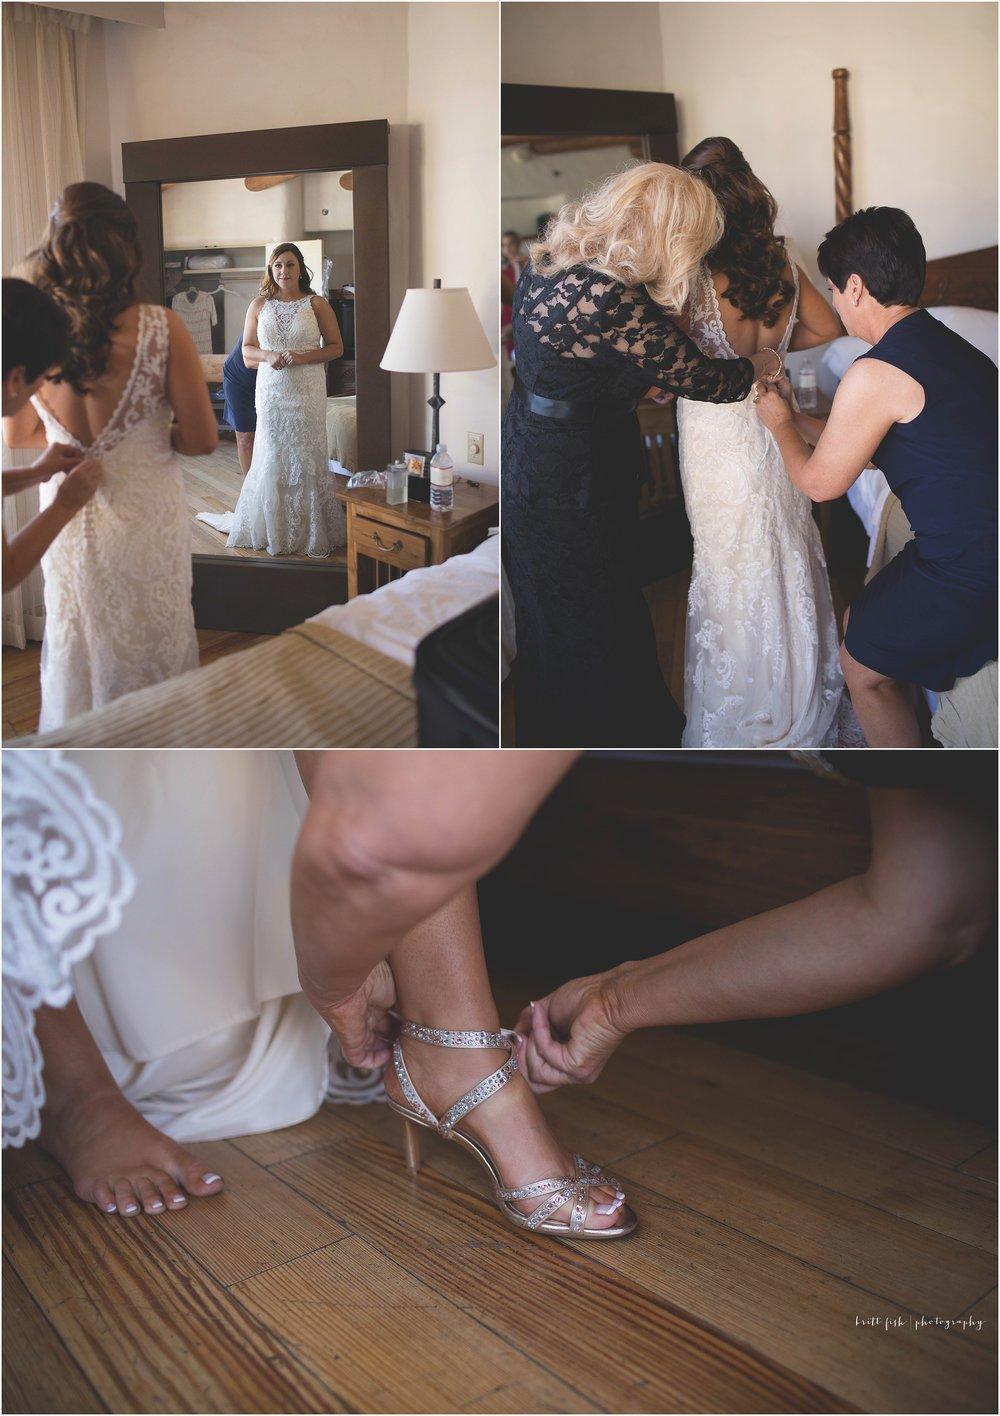 Wedding - Wood - Santa Fe, NM_0009.jpg